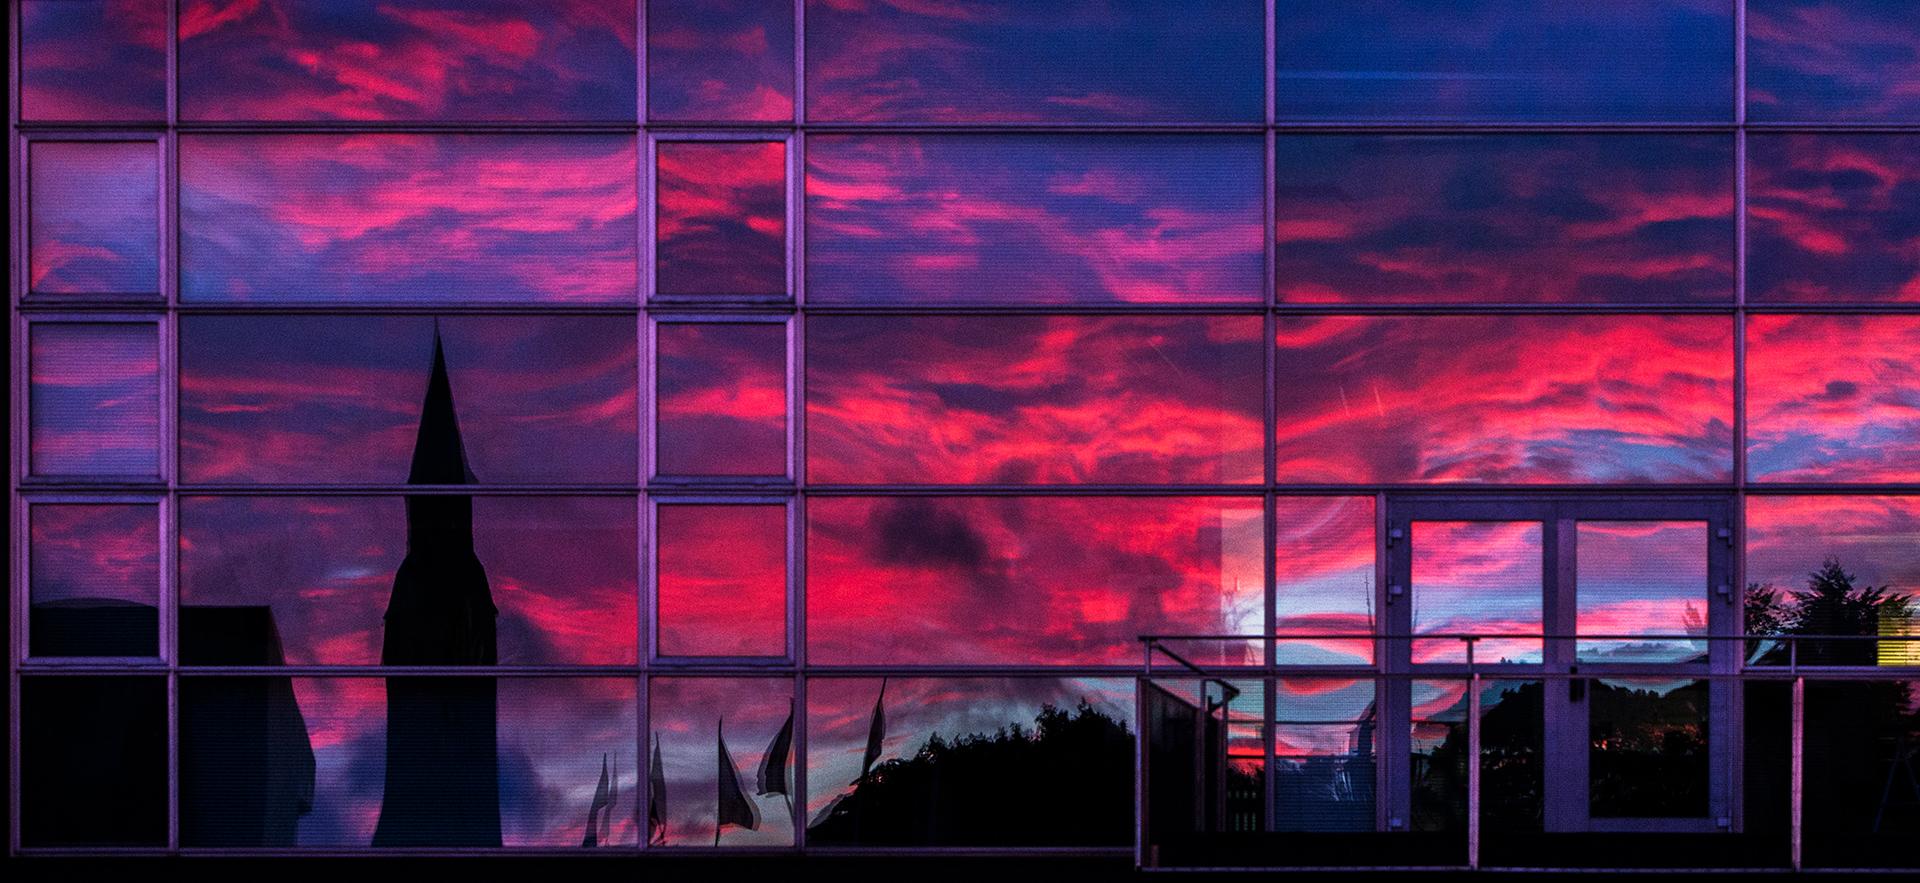 Reflection, Kansallismuseo, National museum of Finland, sunset in the glazing, Kiasma, contemporary art museum, Mannerheimintie, Helsinki